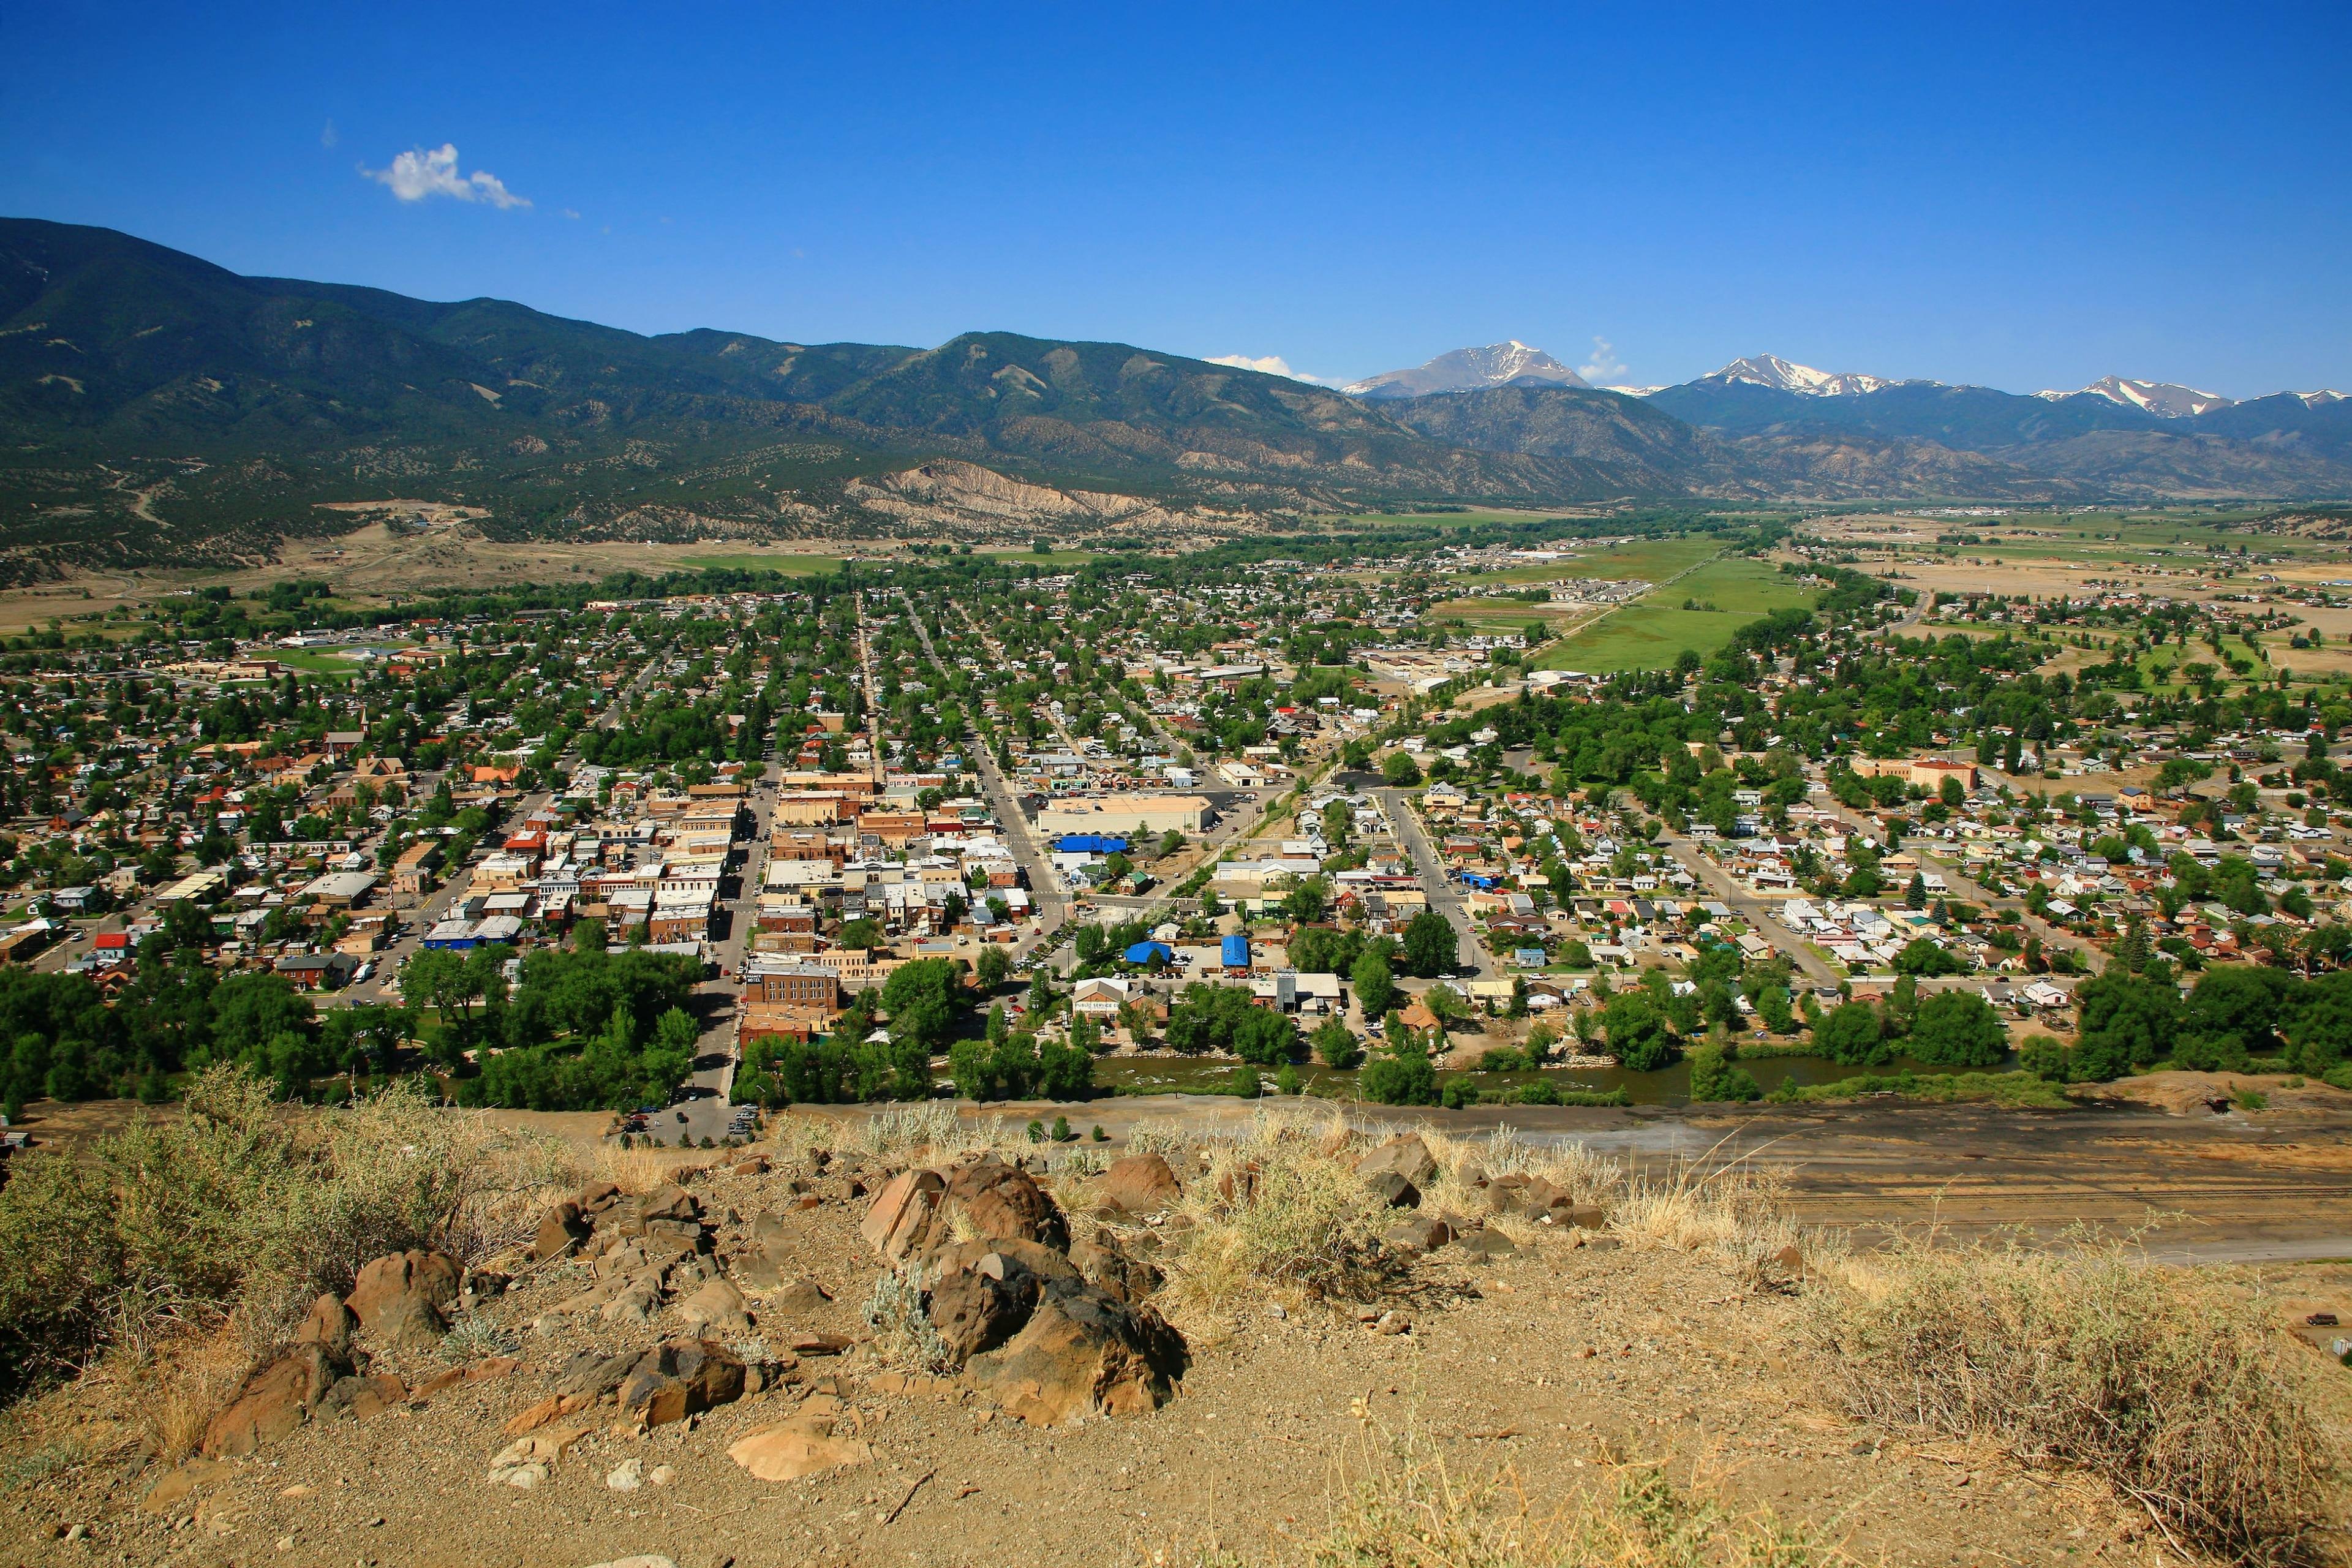 Downtown Salida, Salida, Colorado, United States of America